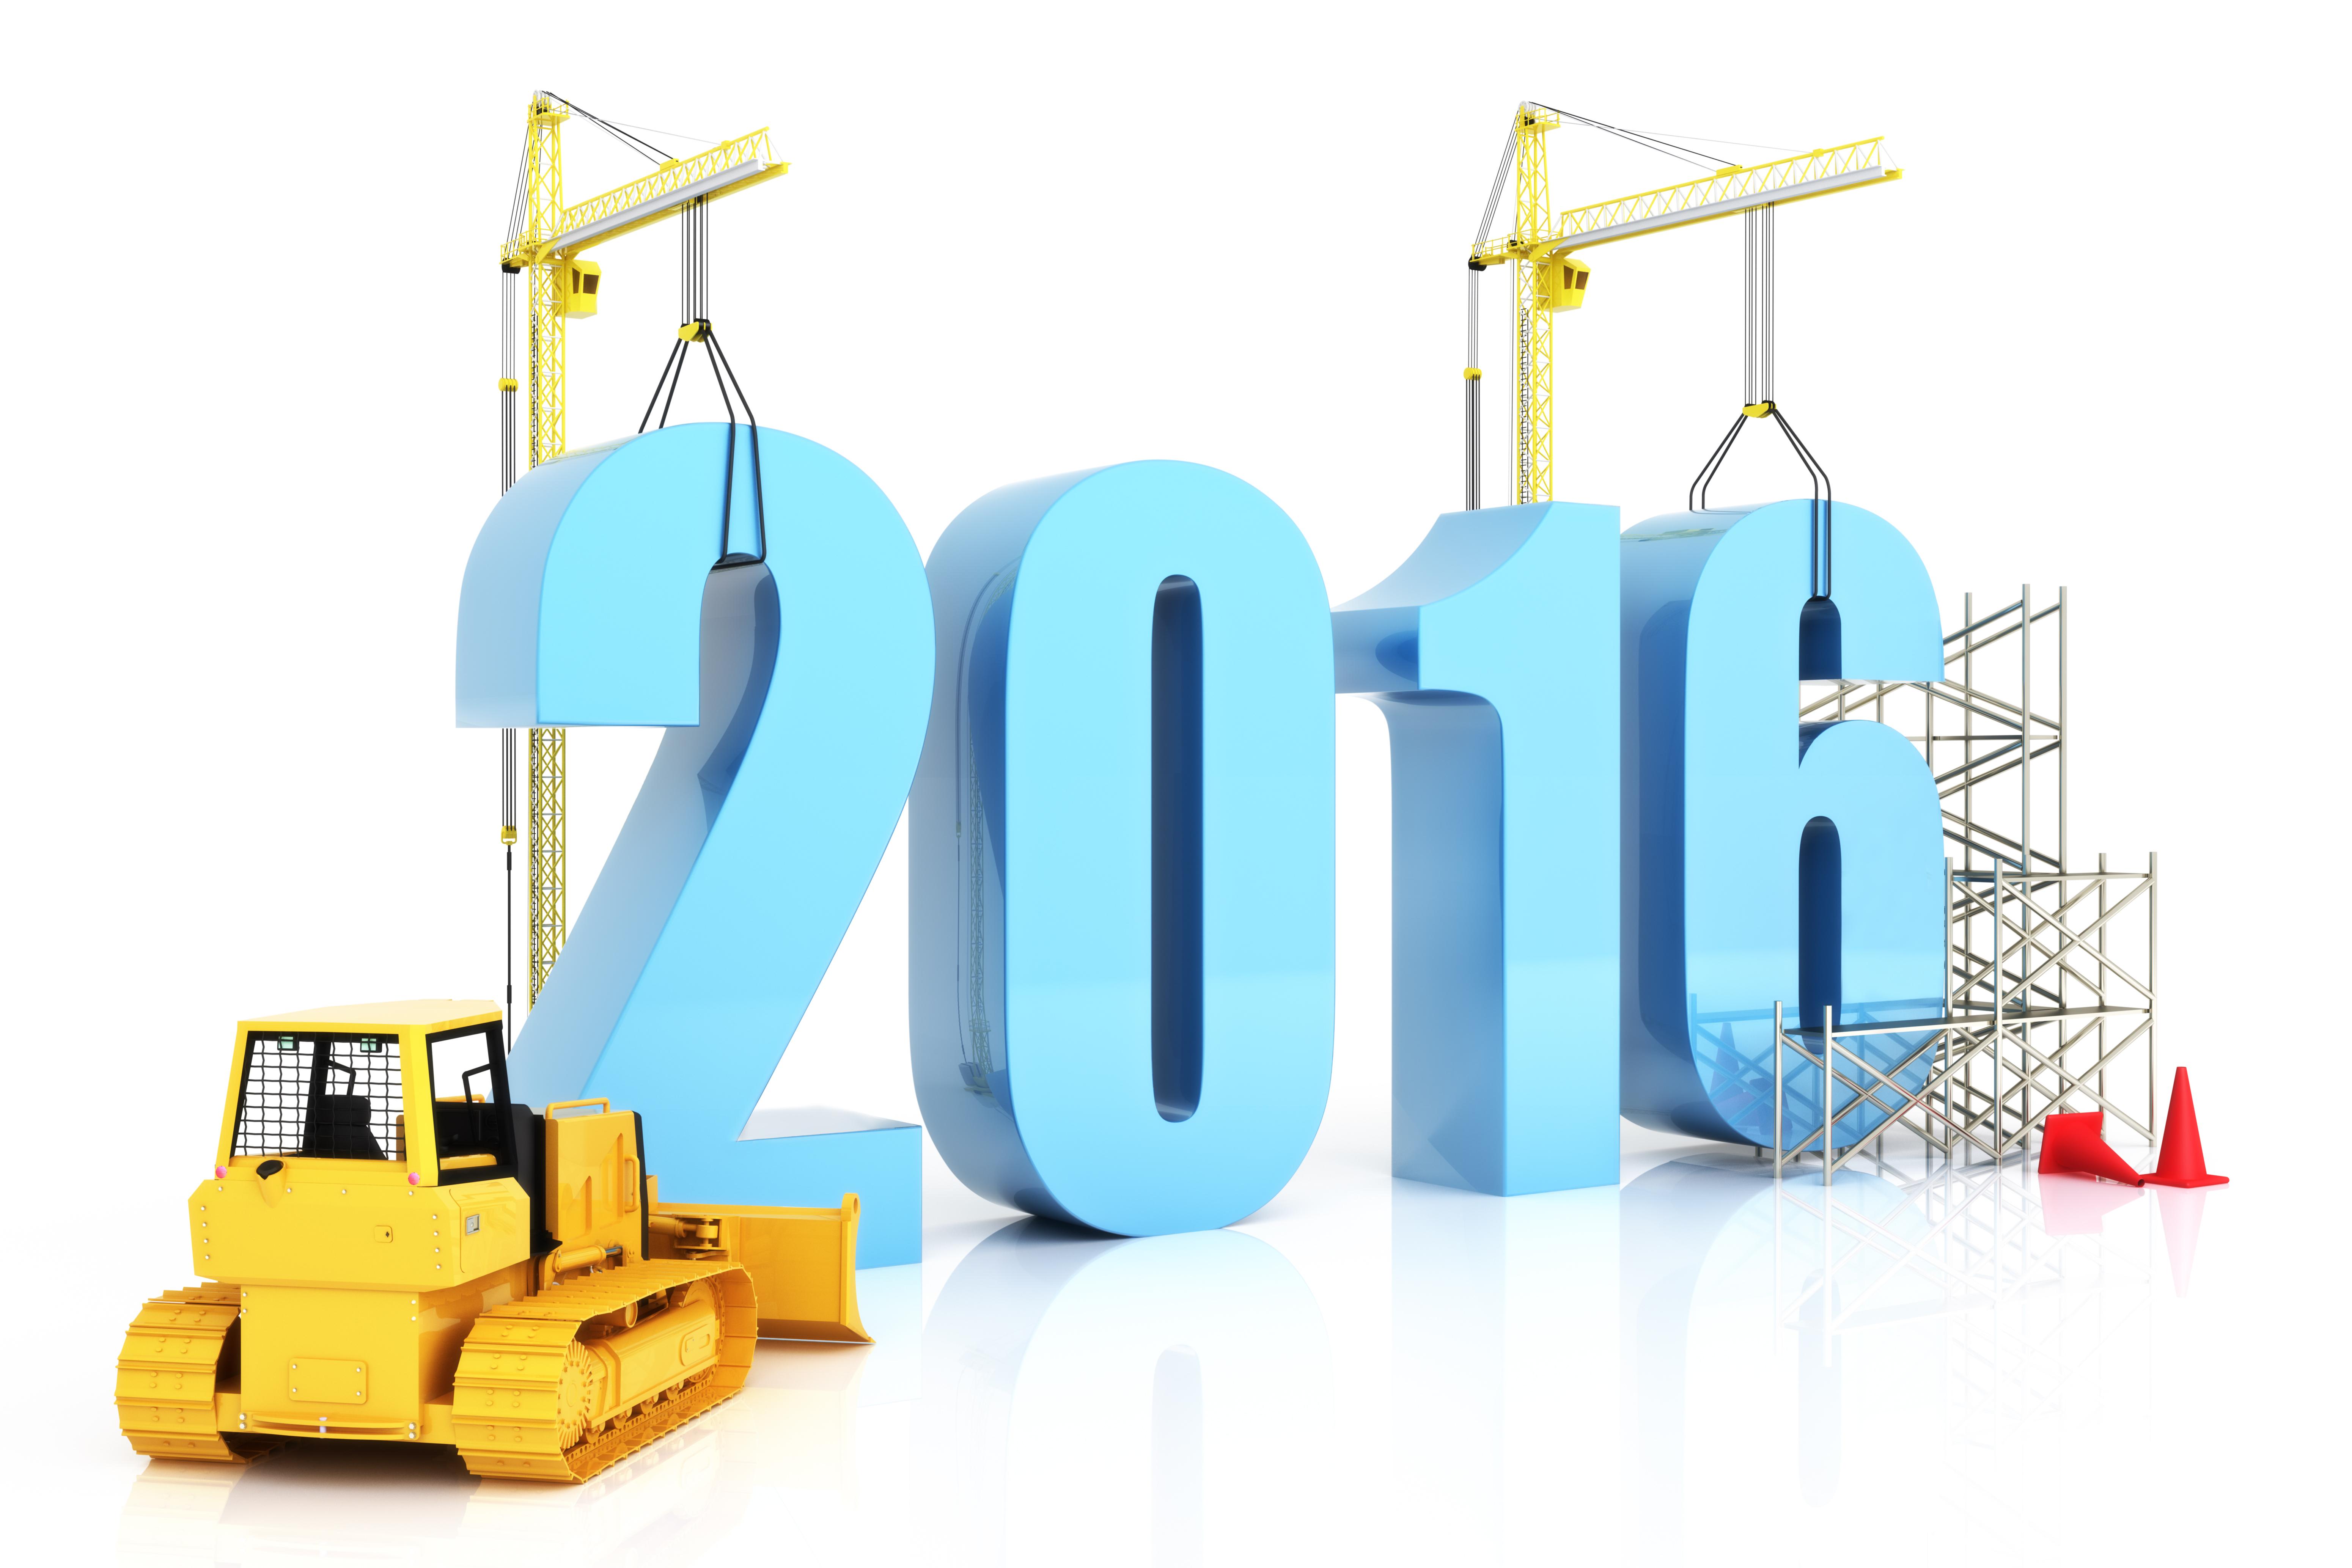 vacances construction 2015 sim5 shutterstock_250943779